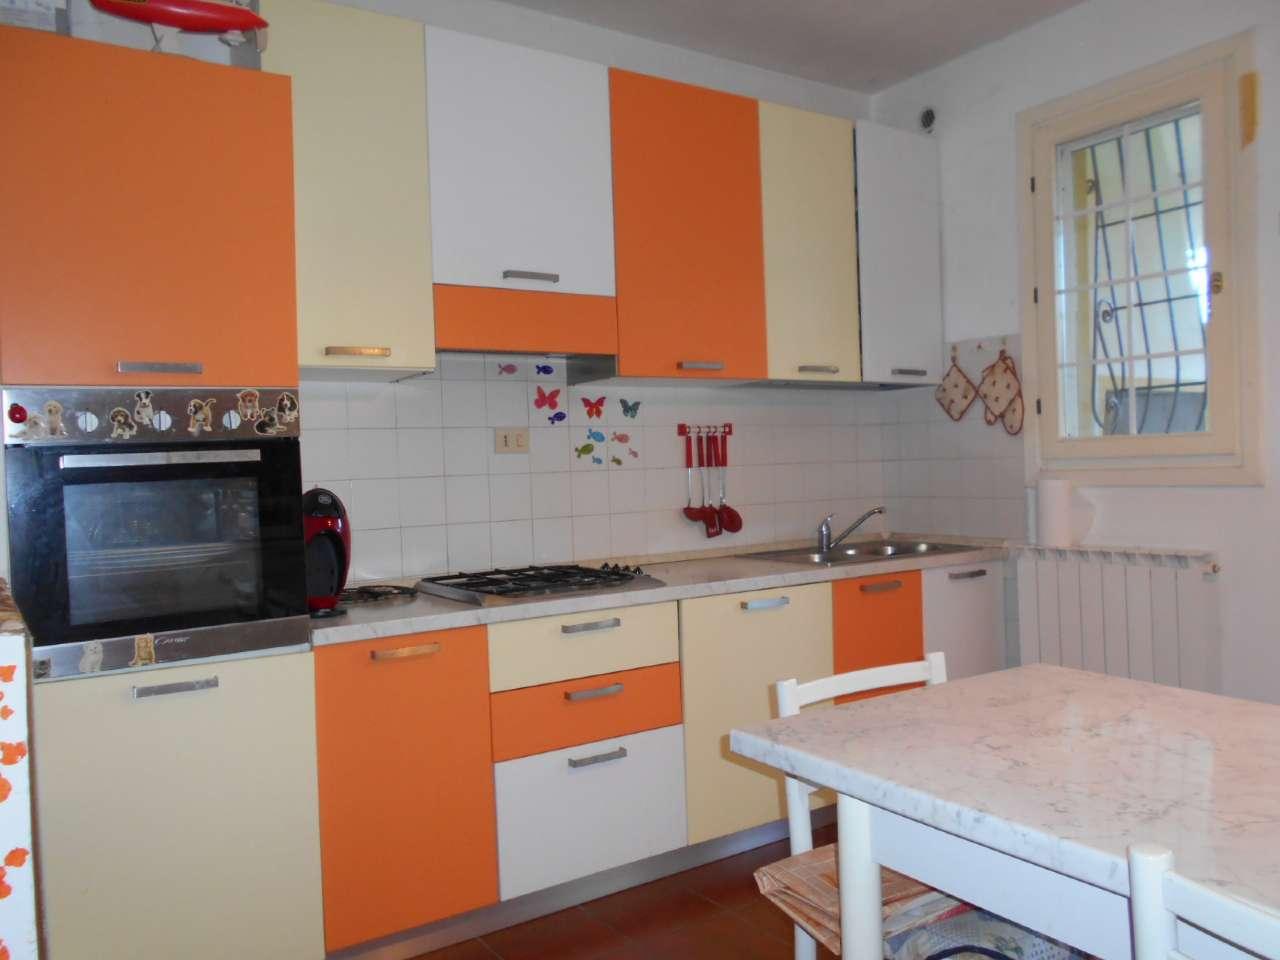 Villetta, Via Umago, Caorle, foto 2